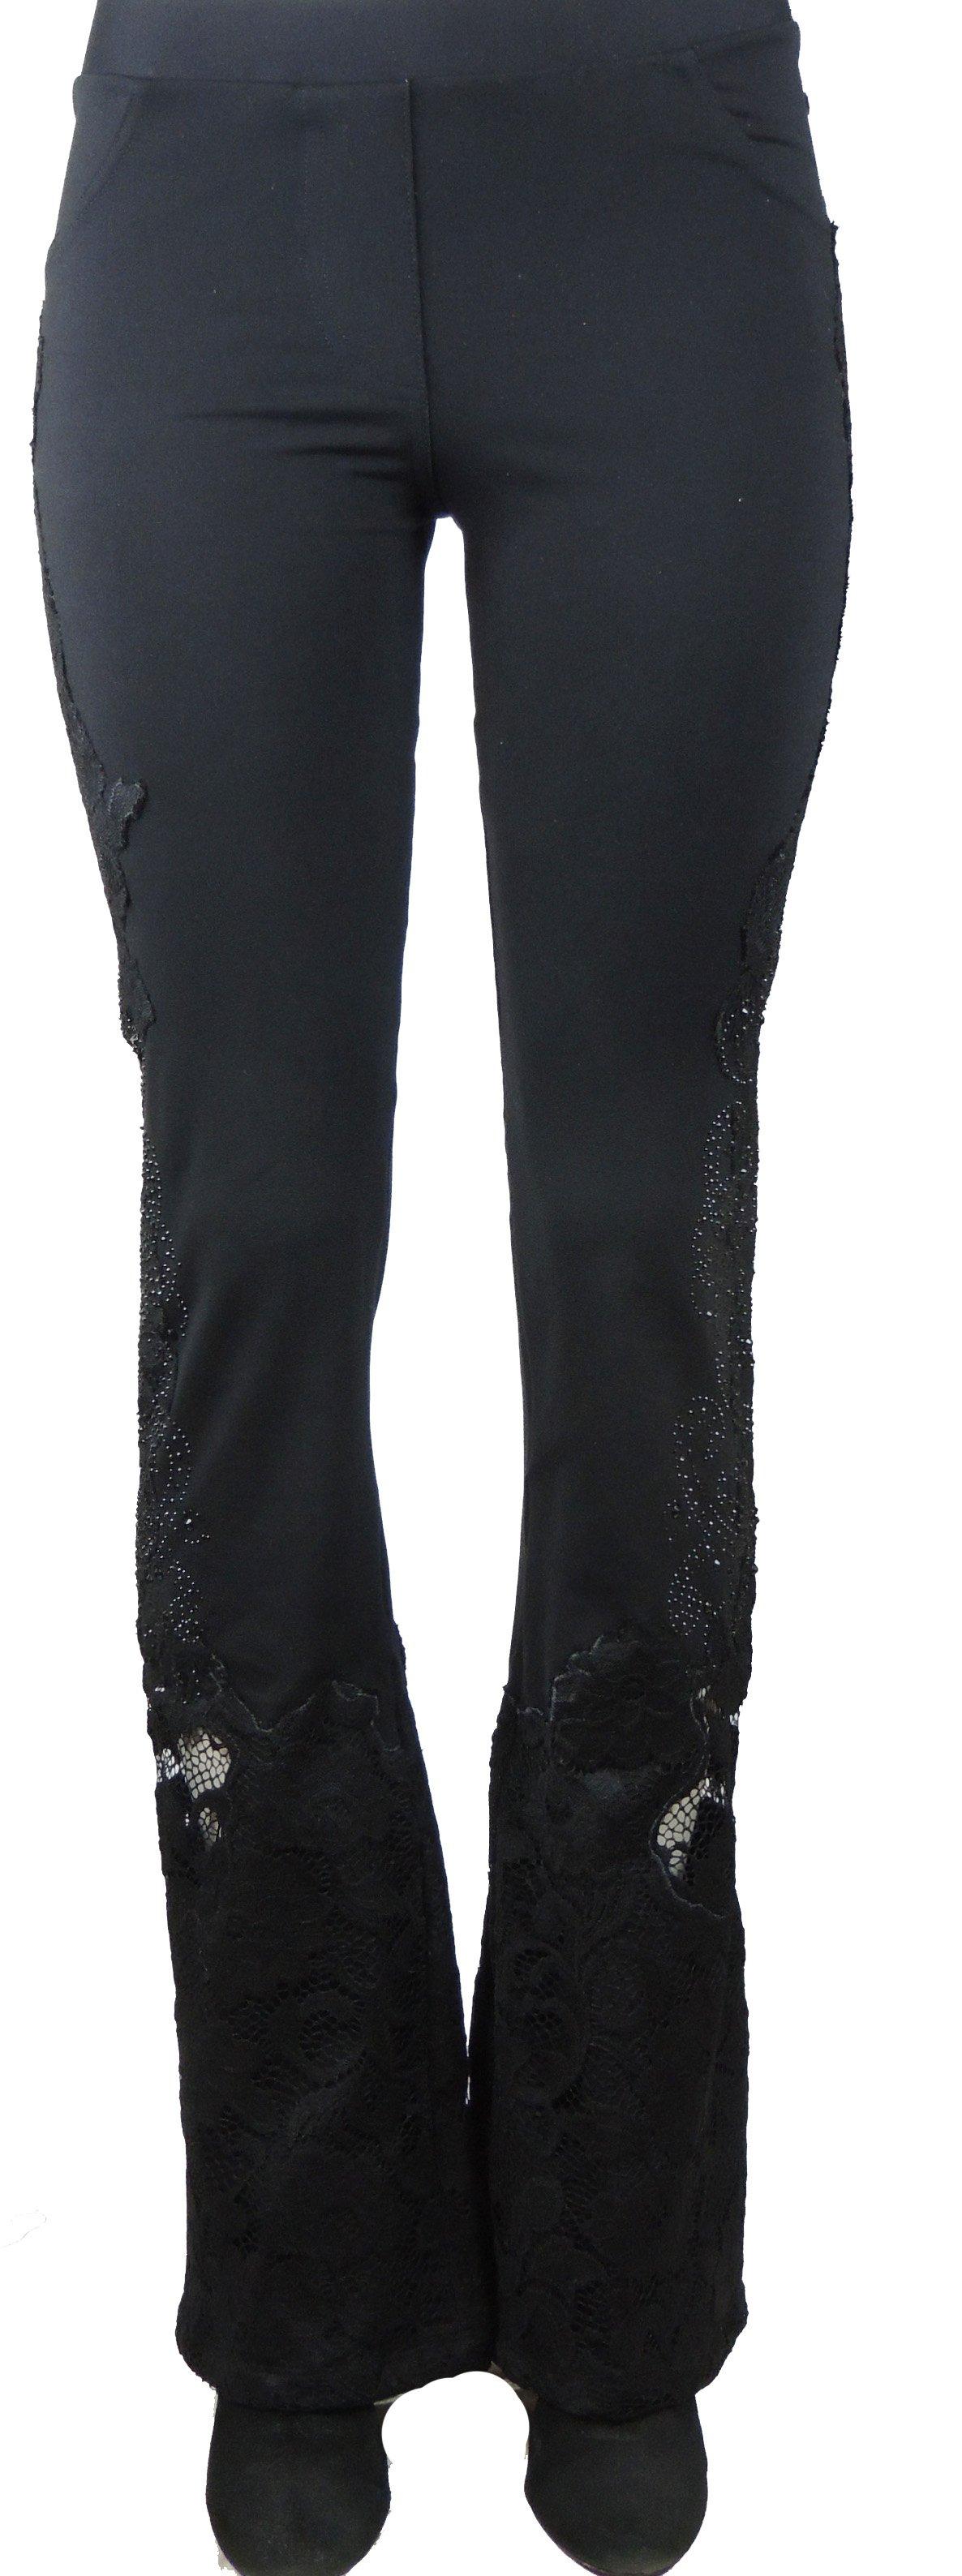 Ballerina lace FW6123